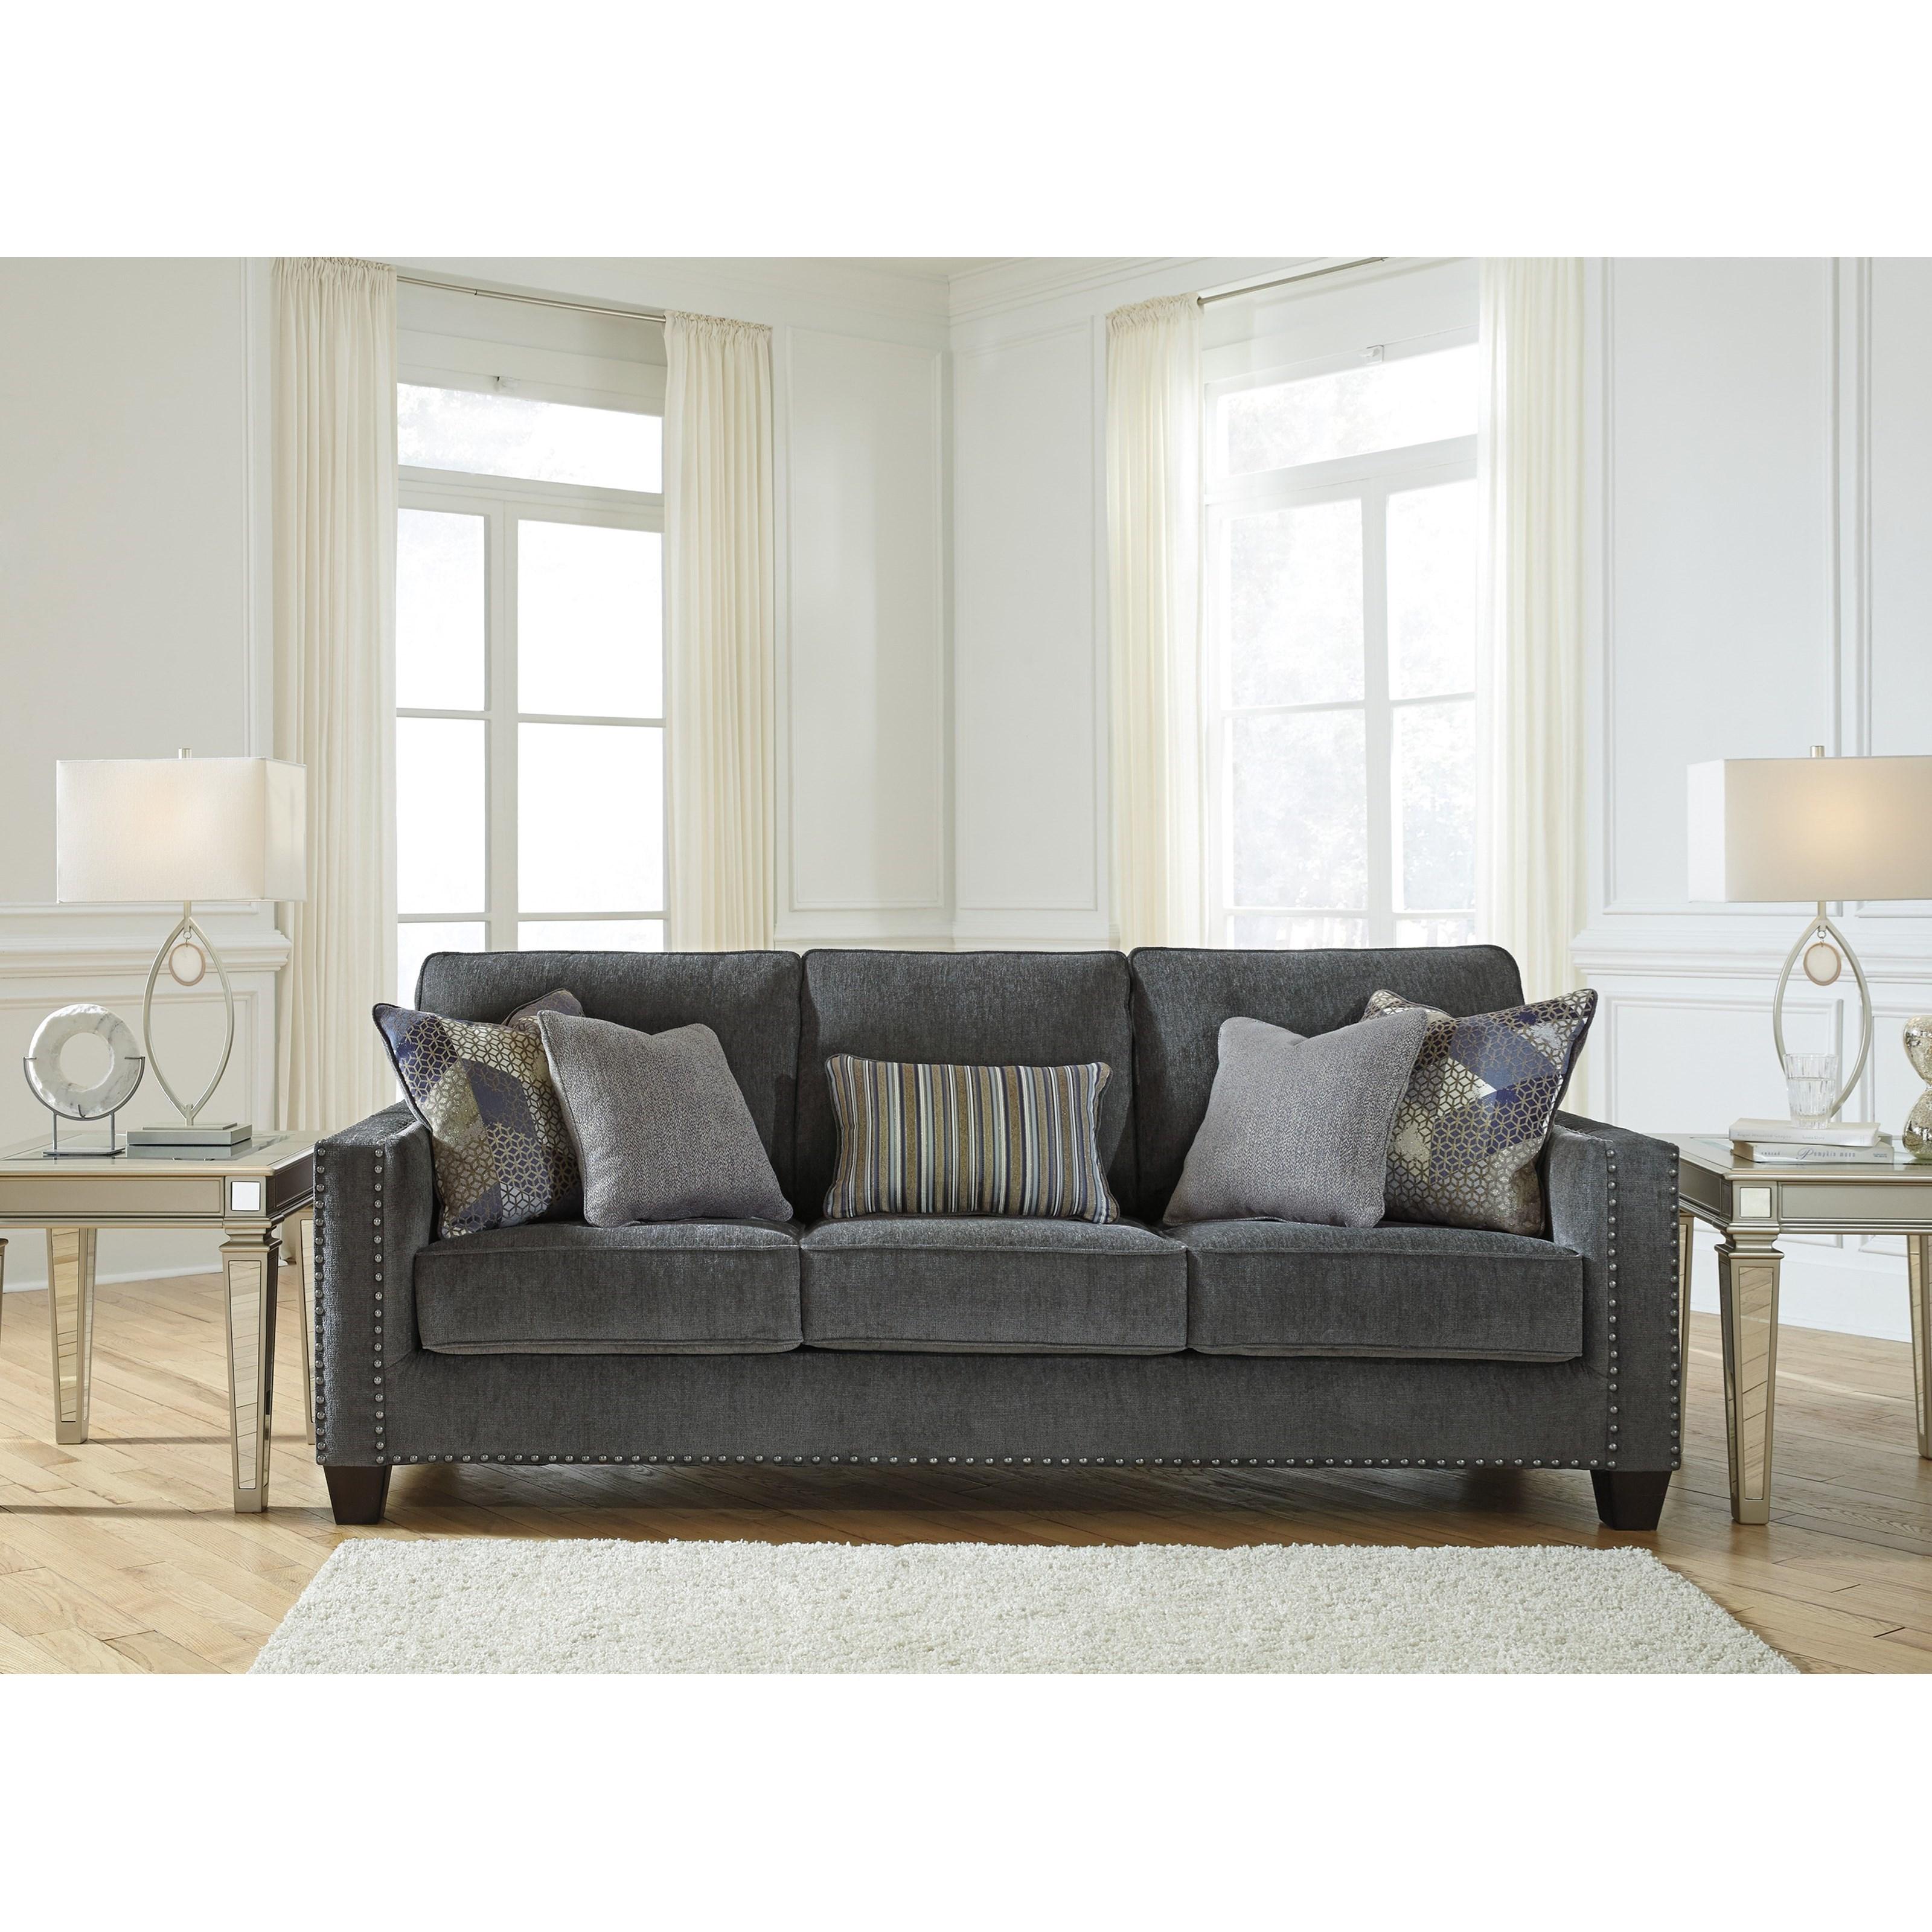 Modern Nailhead Sofa: Benchcraft Gavril Contemporary Sofa With Nailhead Trim